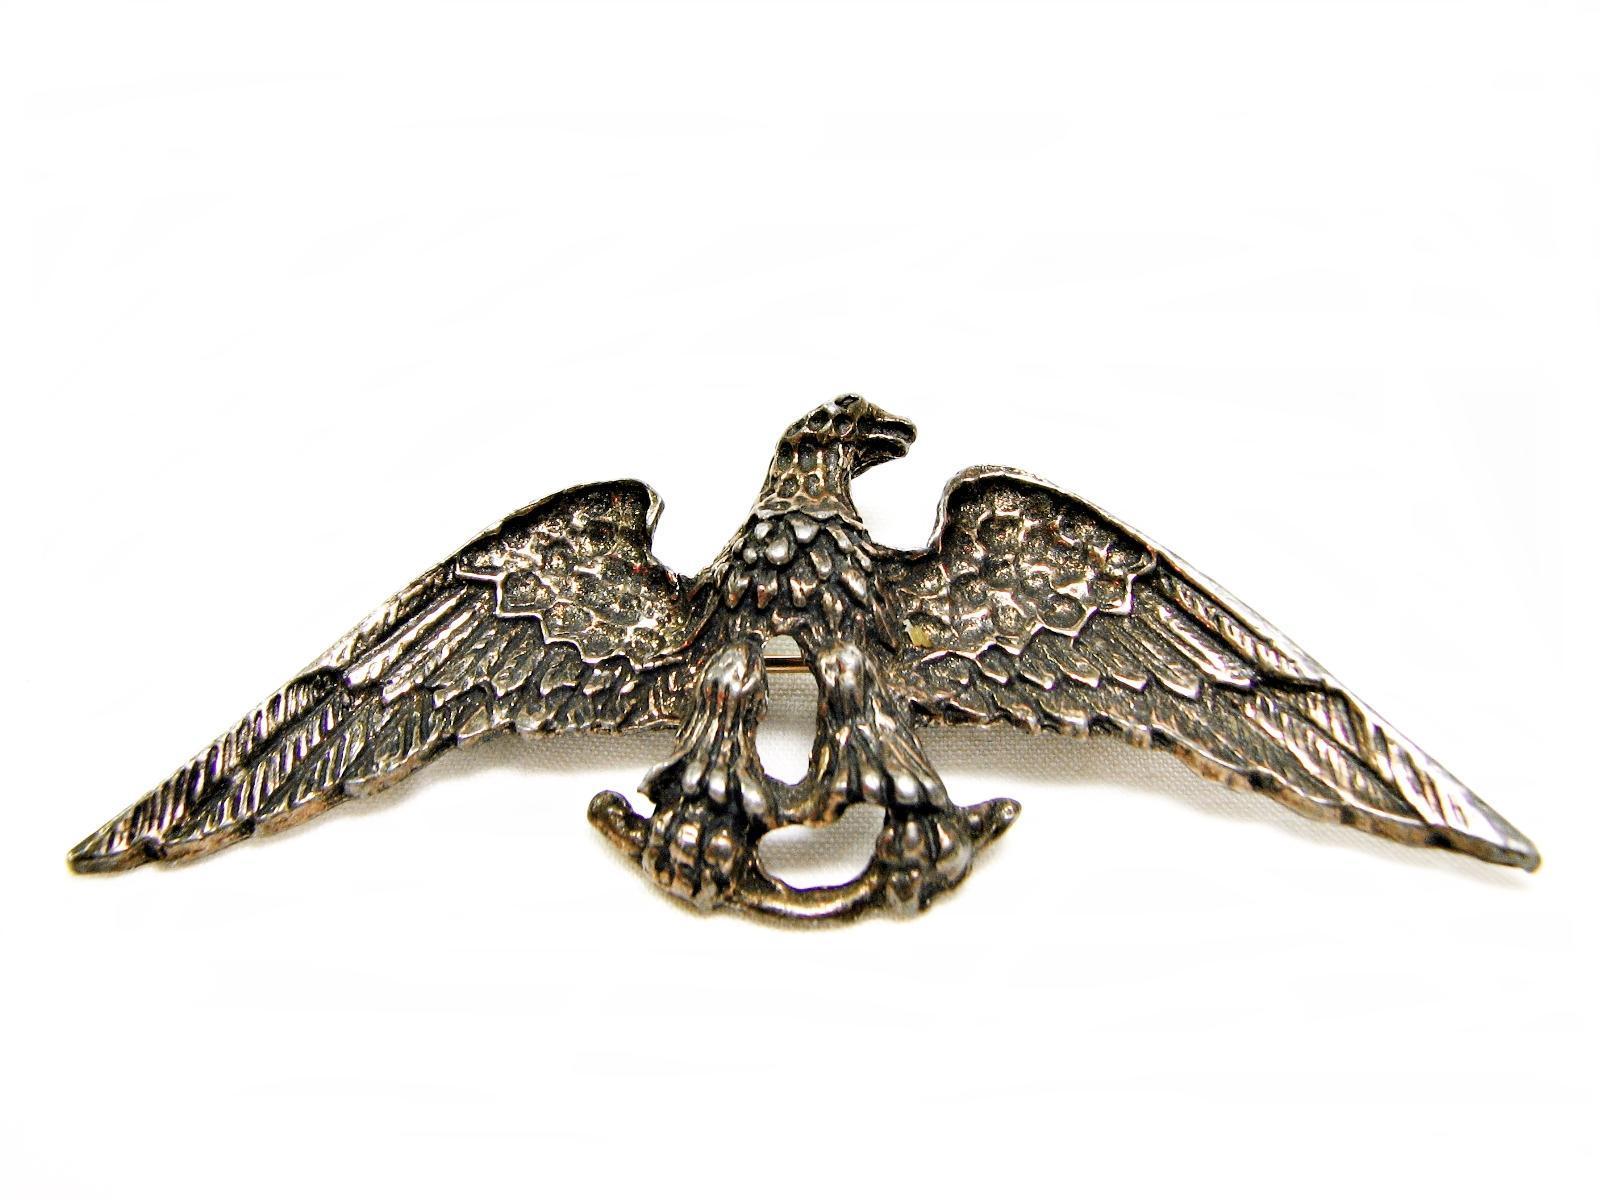 pin 1440x900 american eagle - photo #27